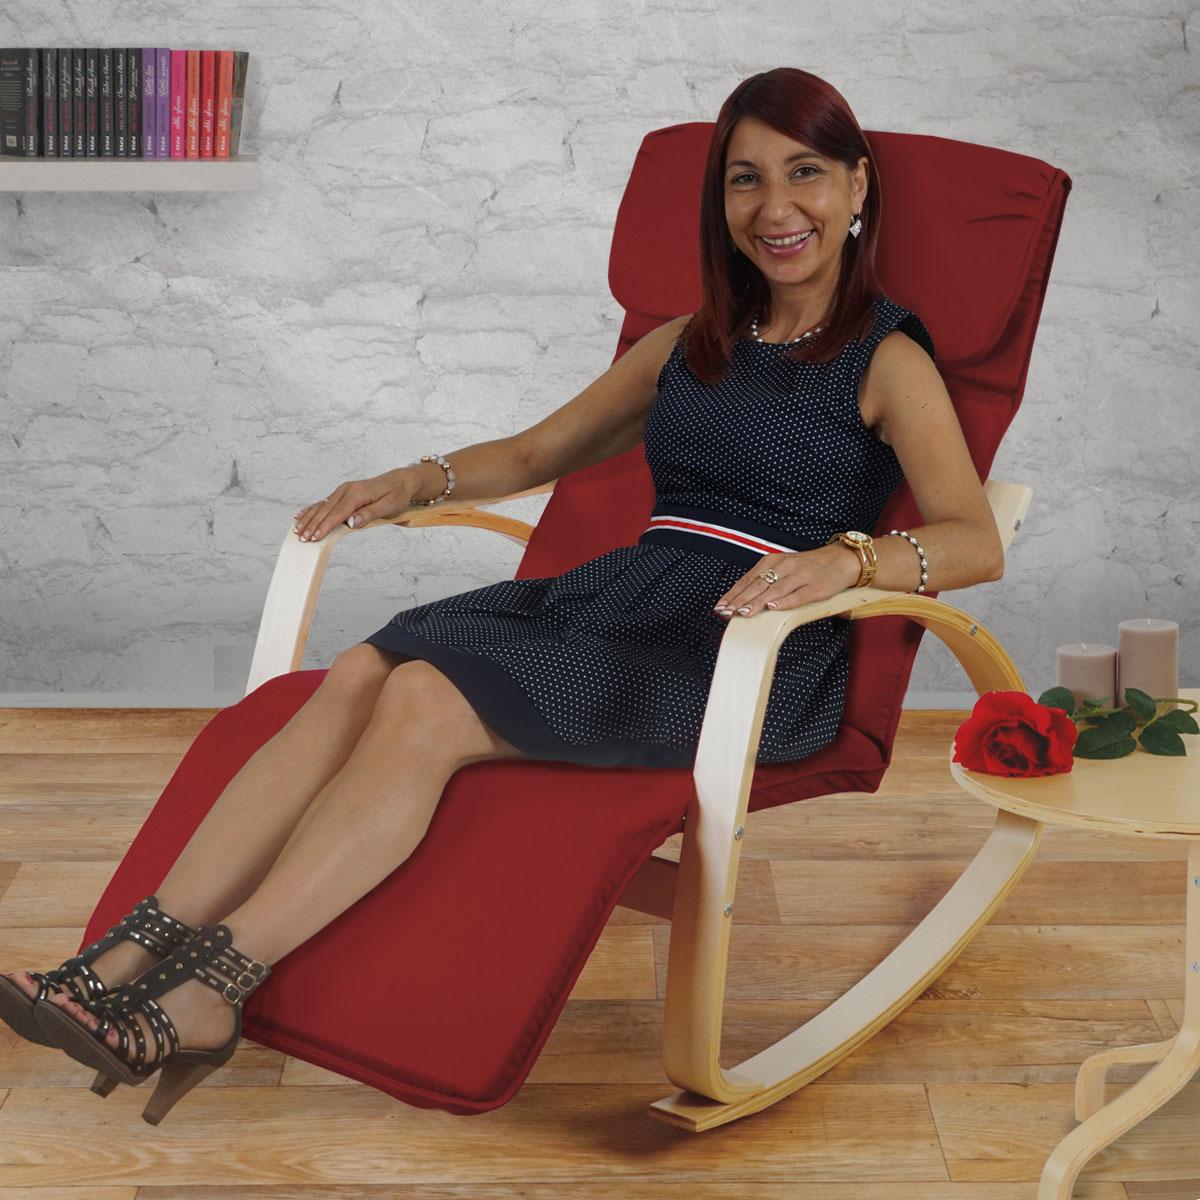 schaukelstuhl malm schwingsessel relaxsessel 95x66x115cm. Black Bedroom Furniture Sets. Home Design Ideas